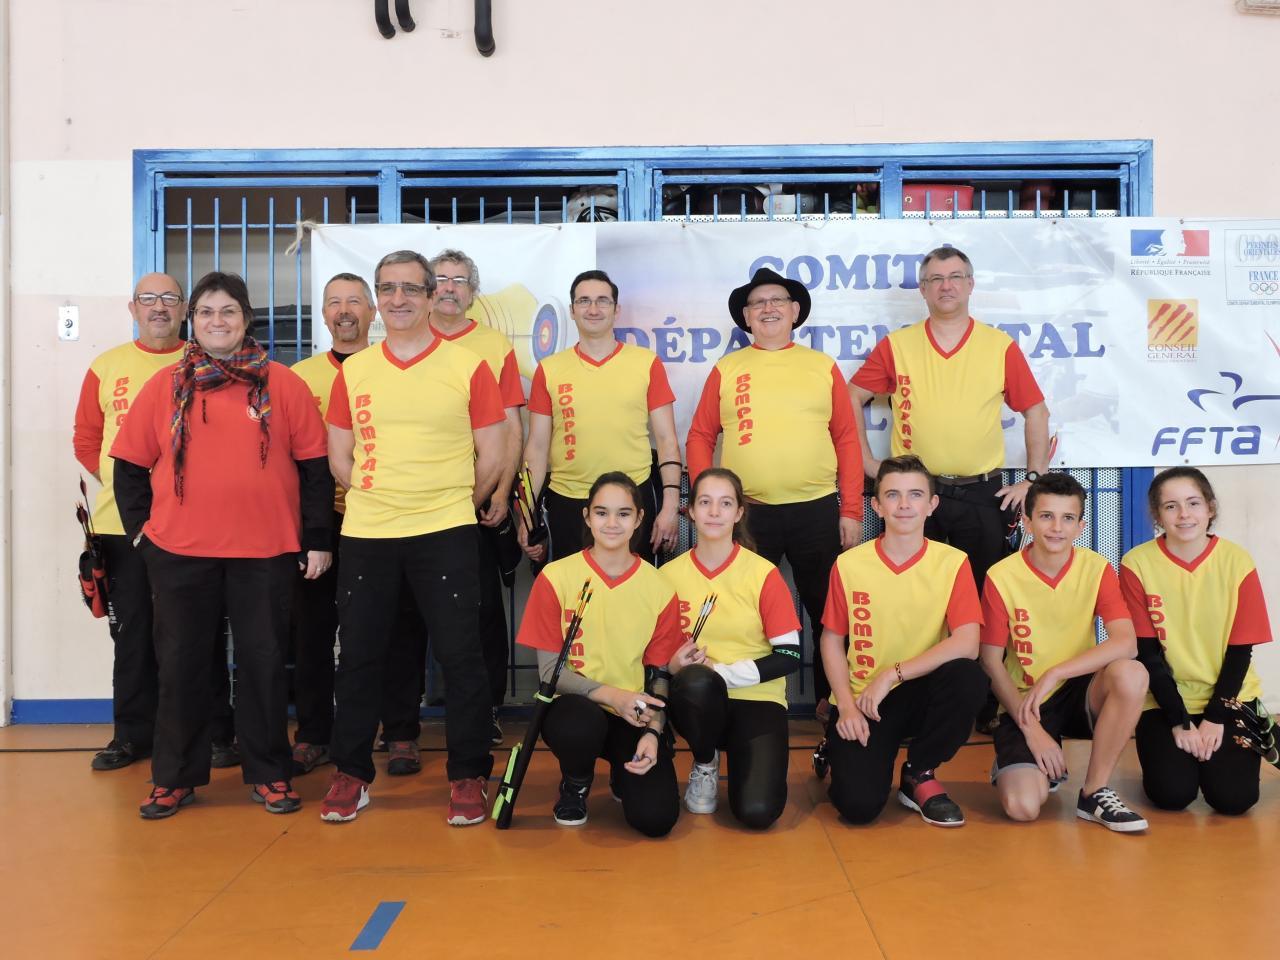 Championnat 66 salle à Perpignan (24/01/16)